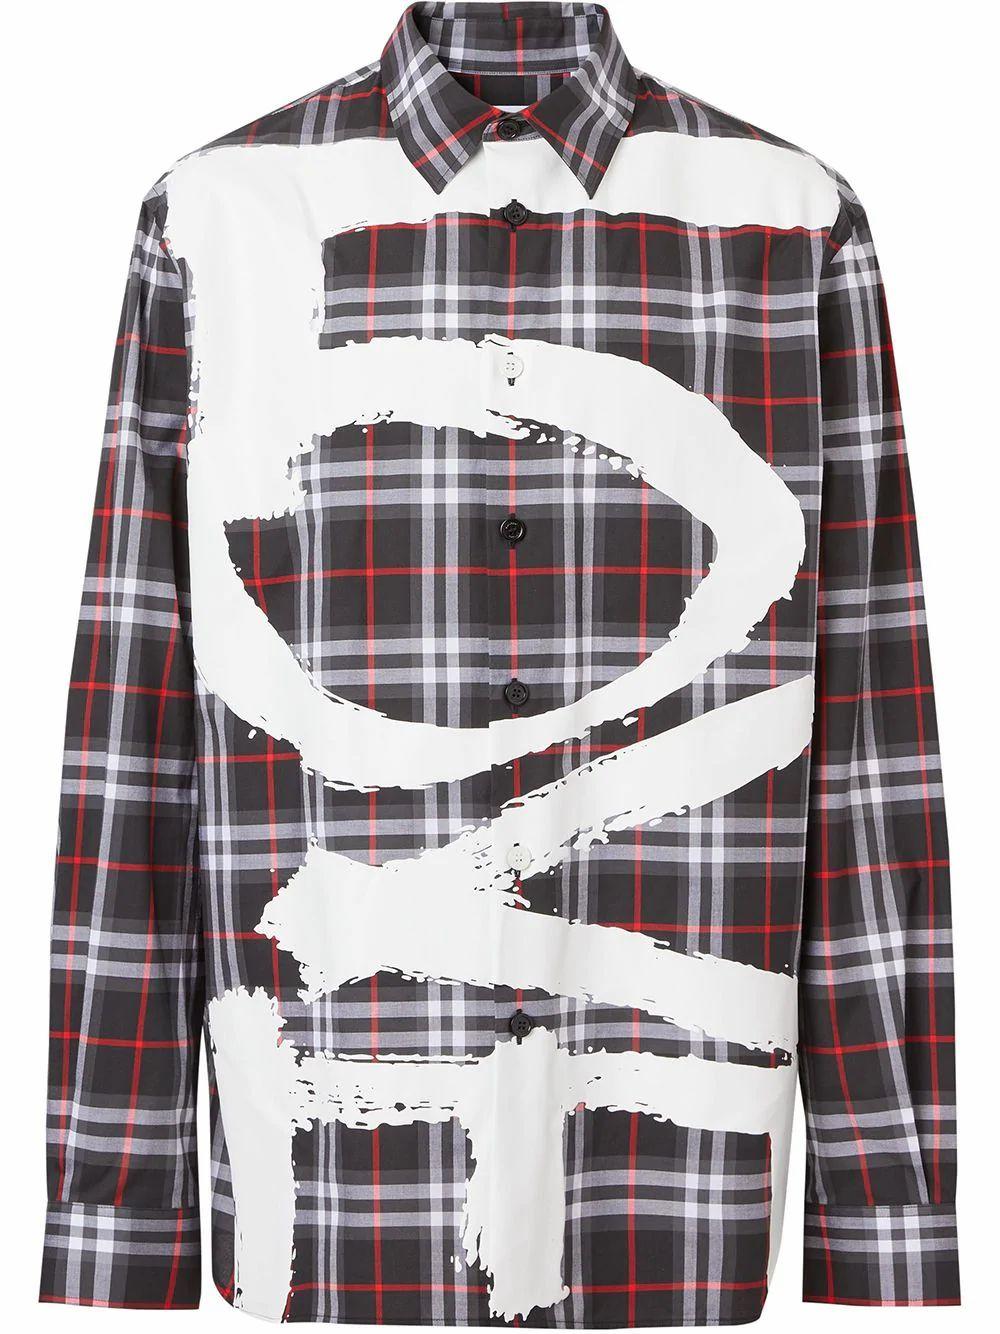 Burberry Shirts BURBERRY MEN'S BLACK COTTON SHIRT